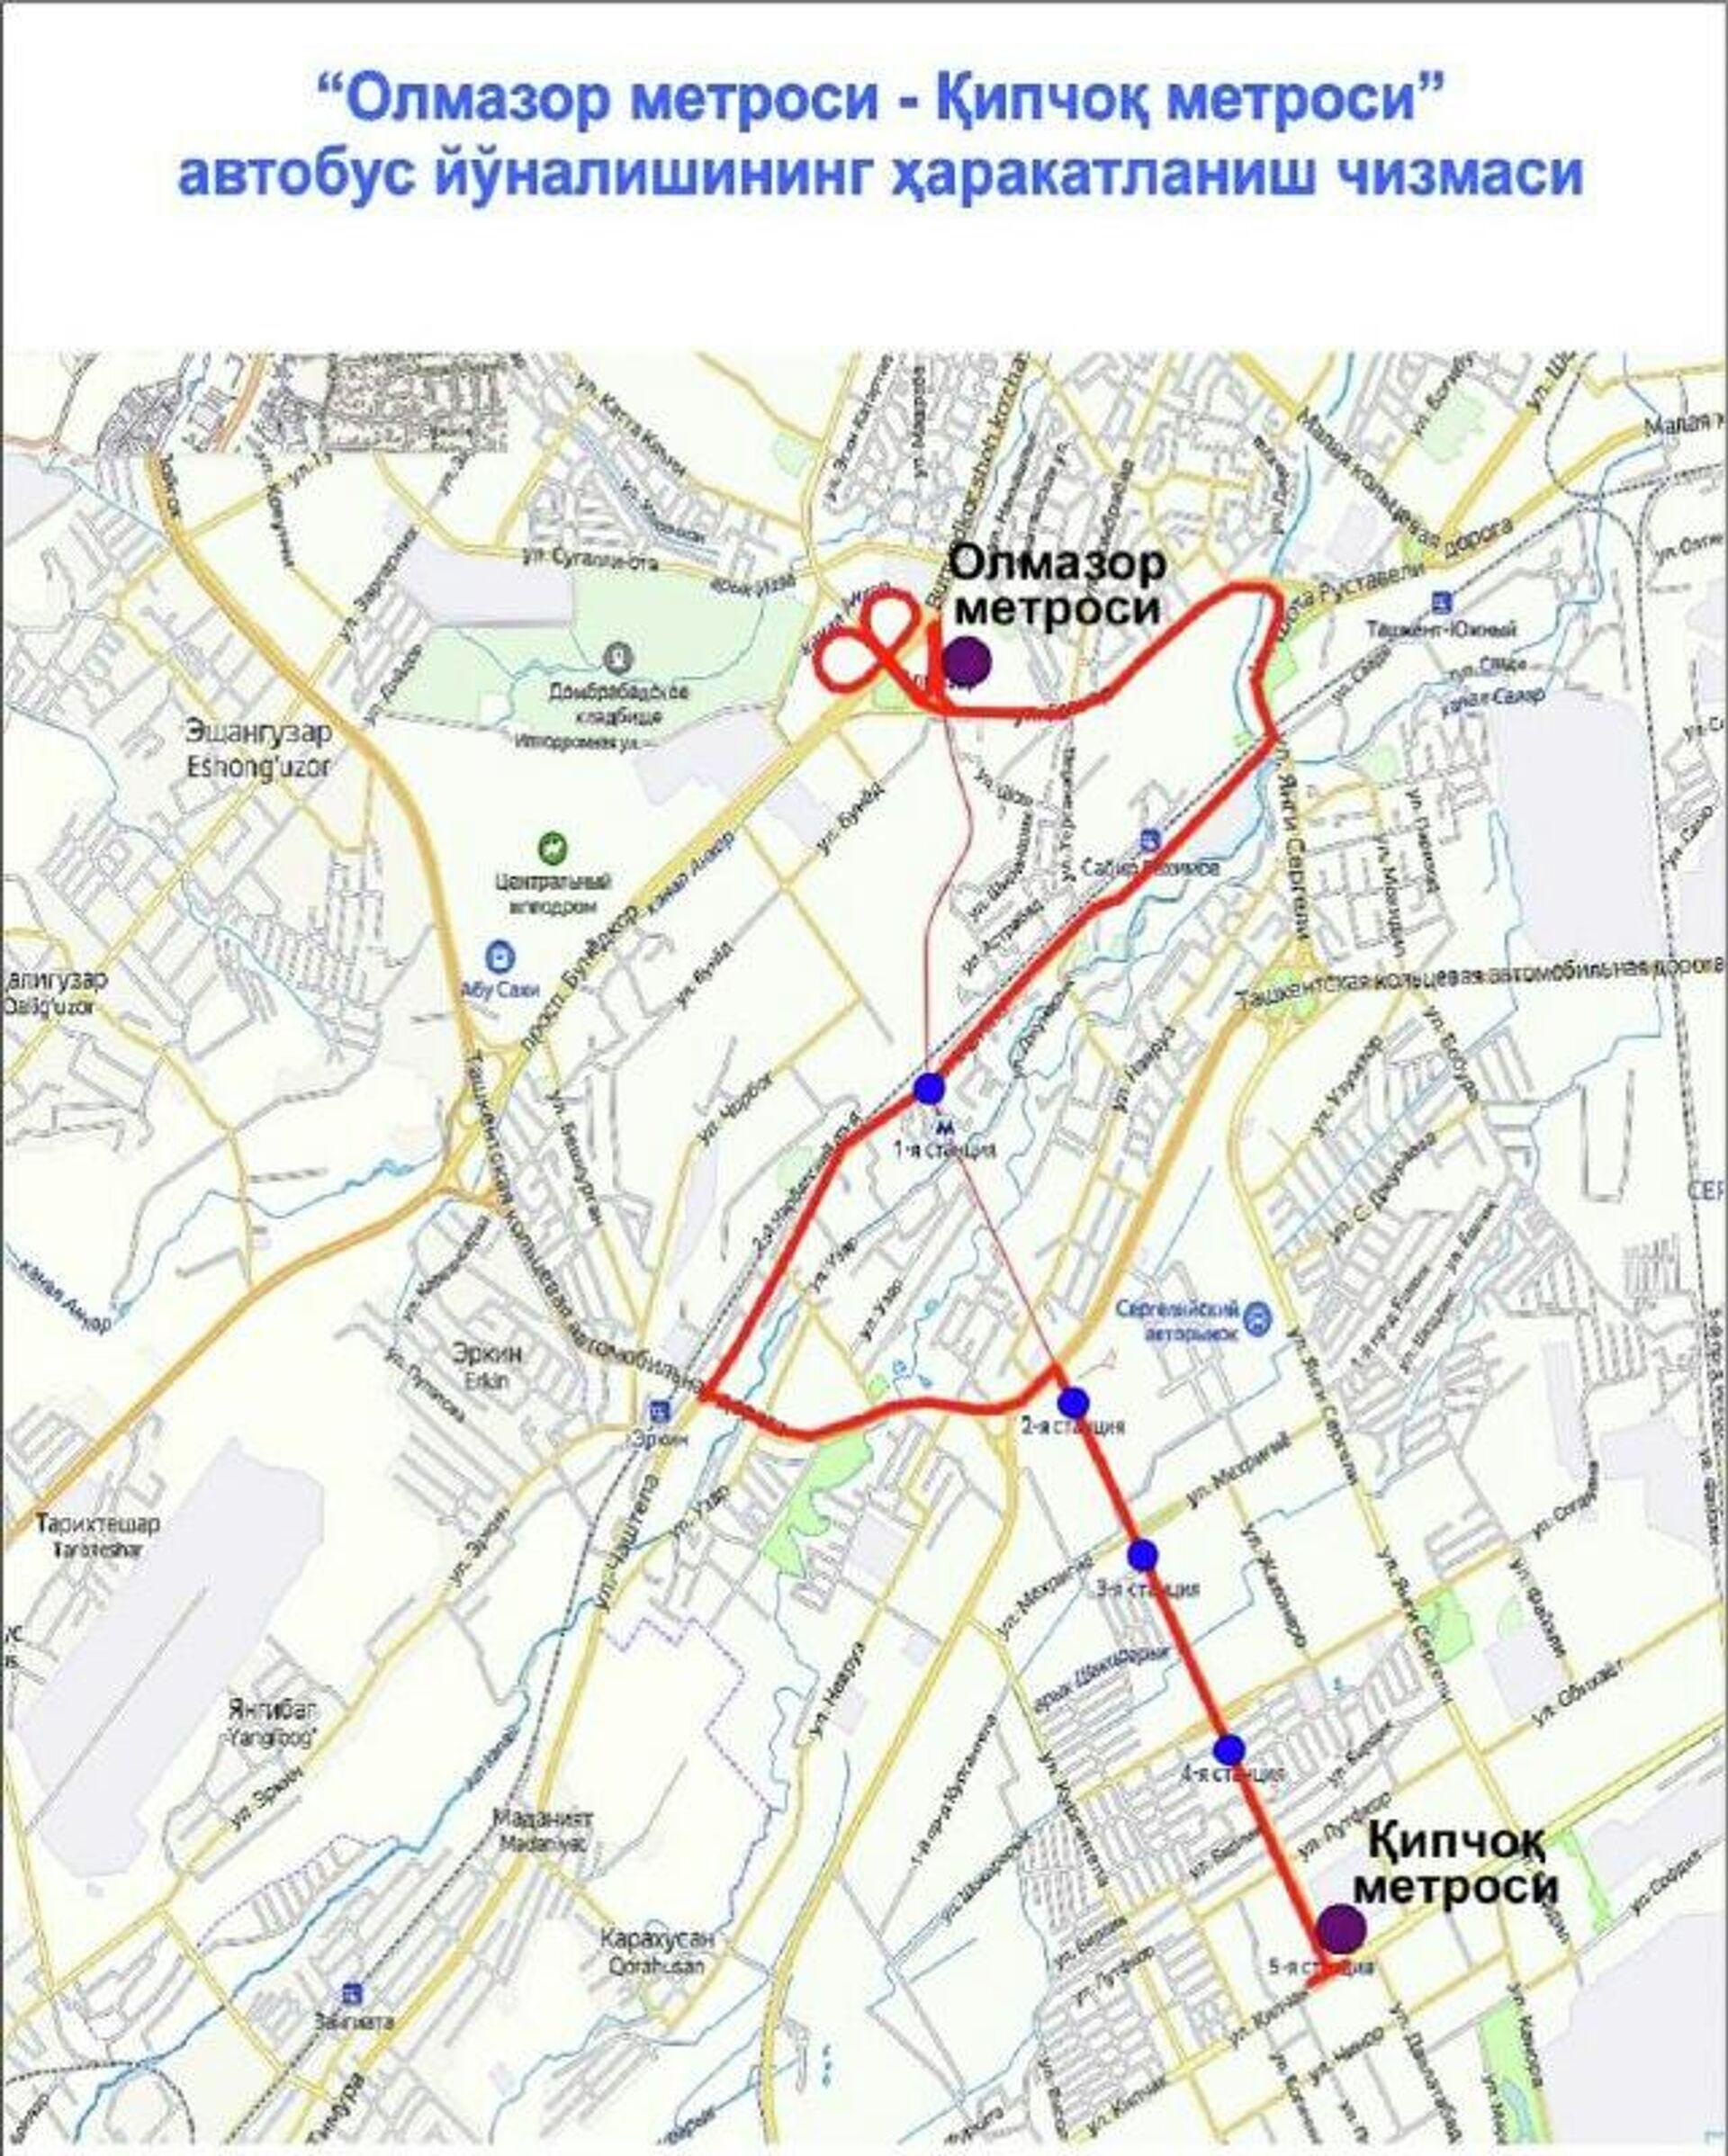 25 сентября будет закрыт отрезок метро в Ташкенте - Sputnik Узбекистан, 1920, 23.09.2021